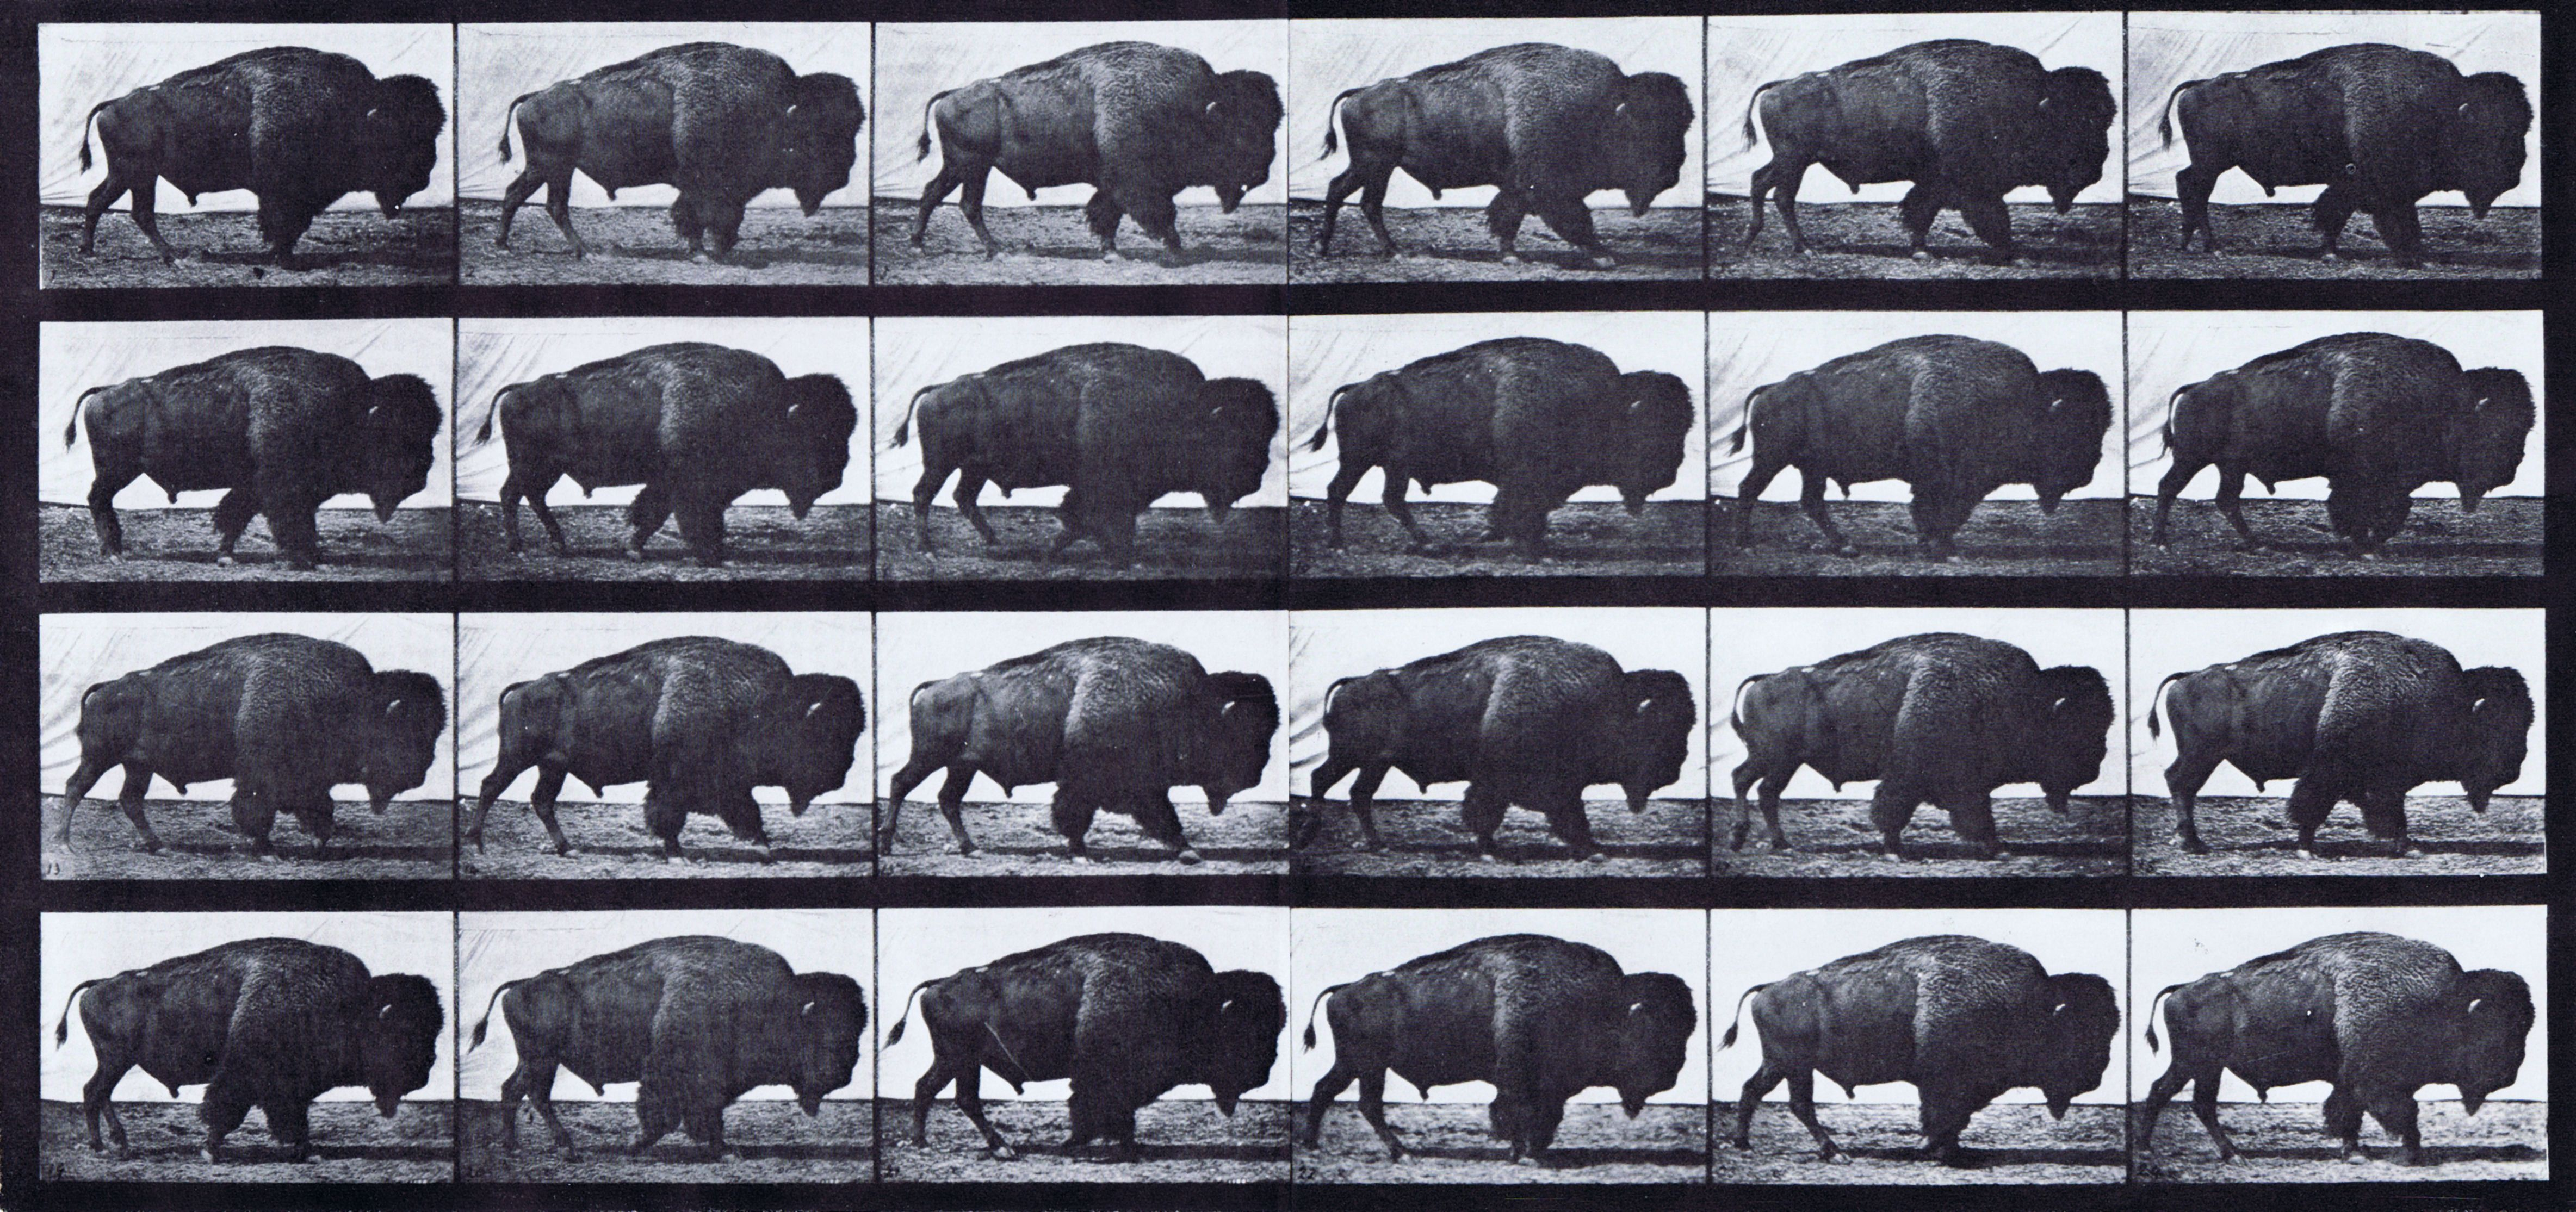 large profile view of buffalo walking animation reference using ...